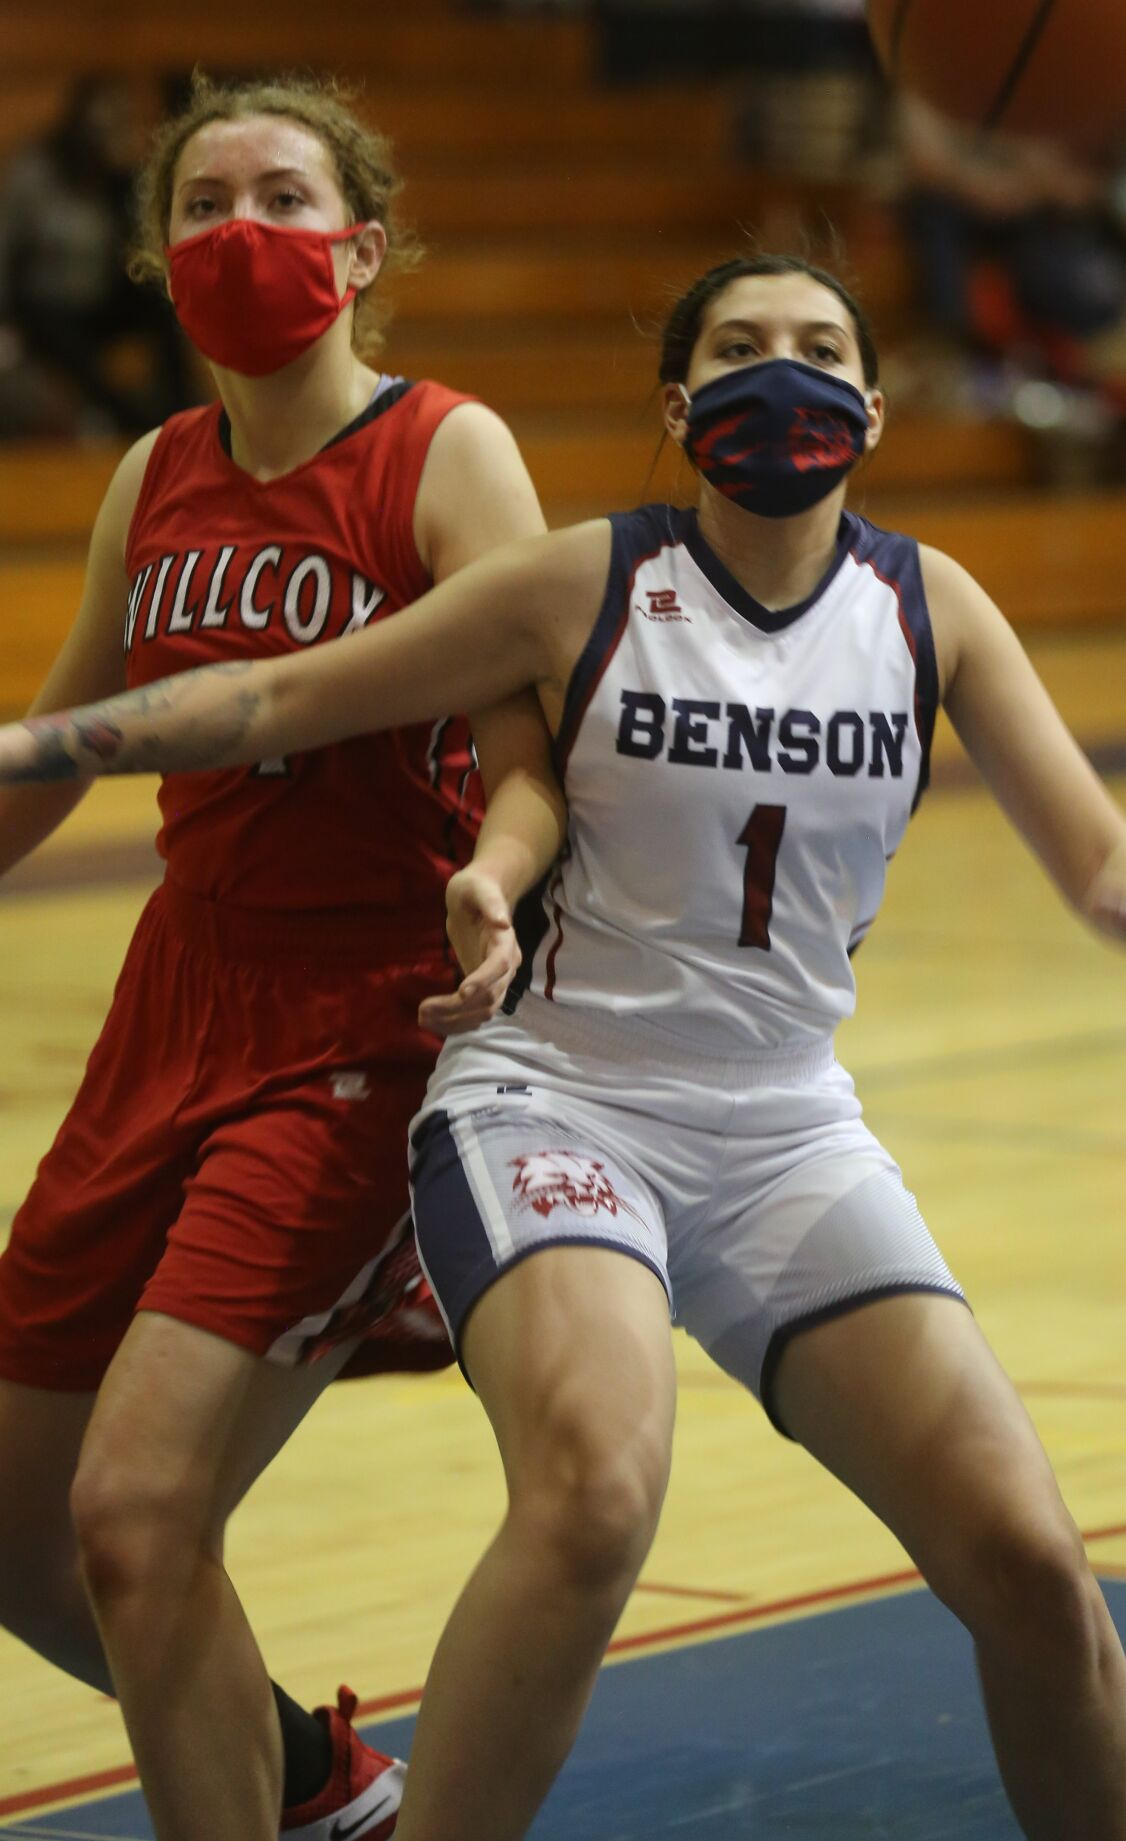 Benson v Willcox 2